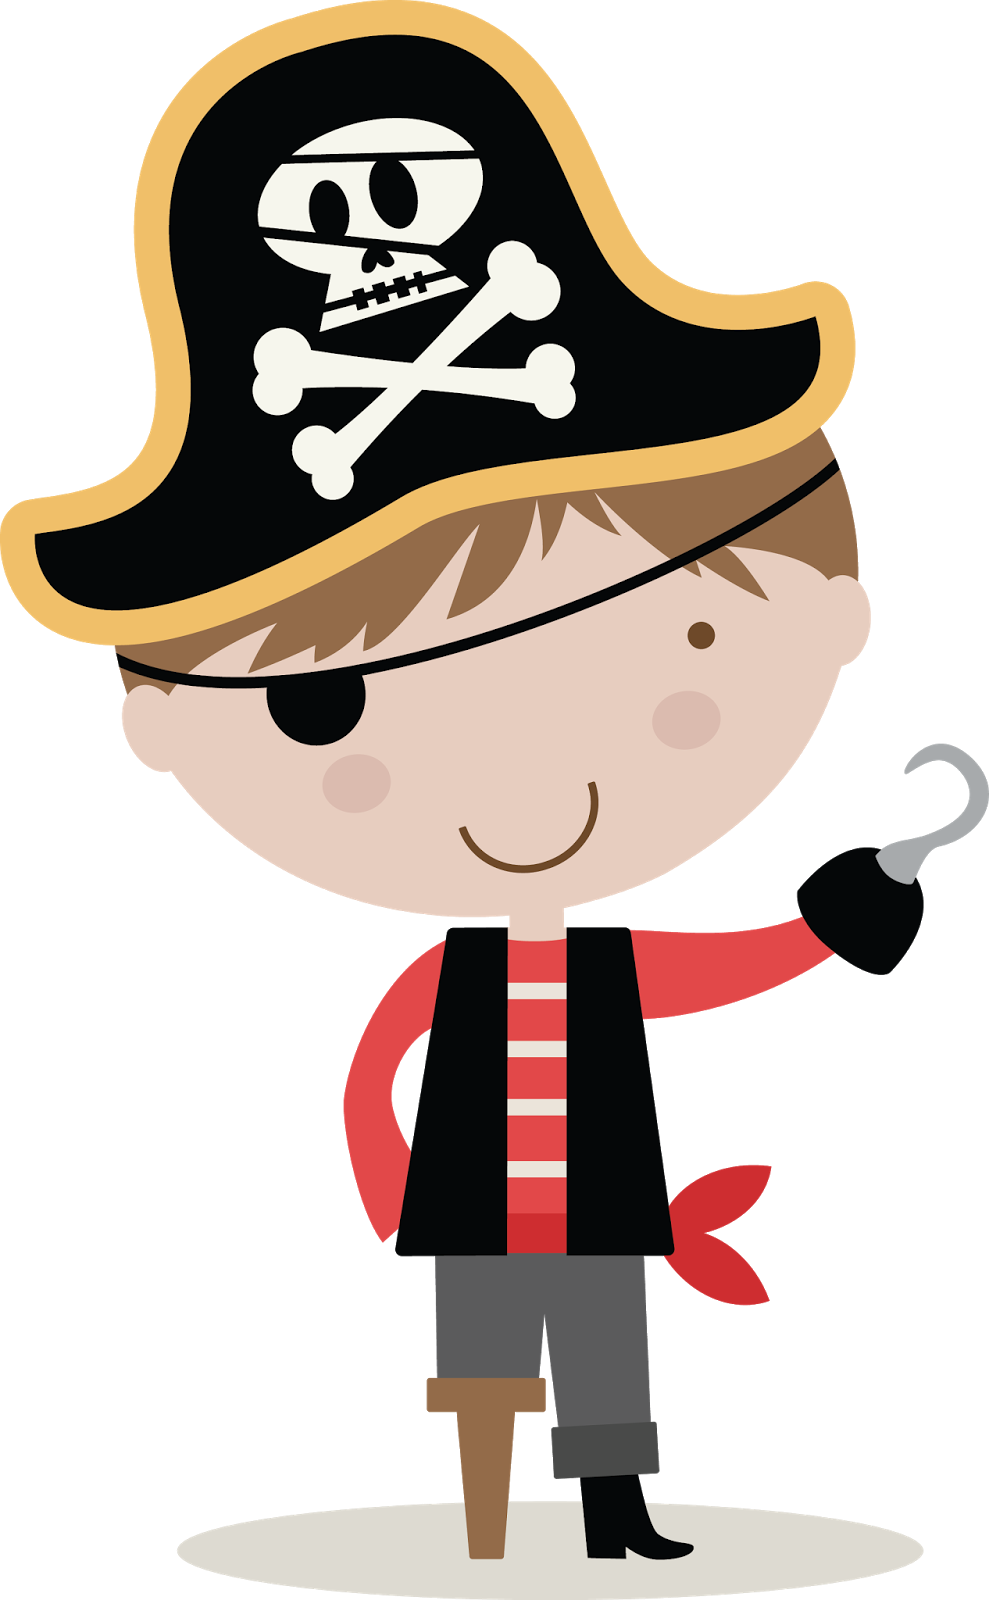 Pirates PNG - 2212